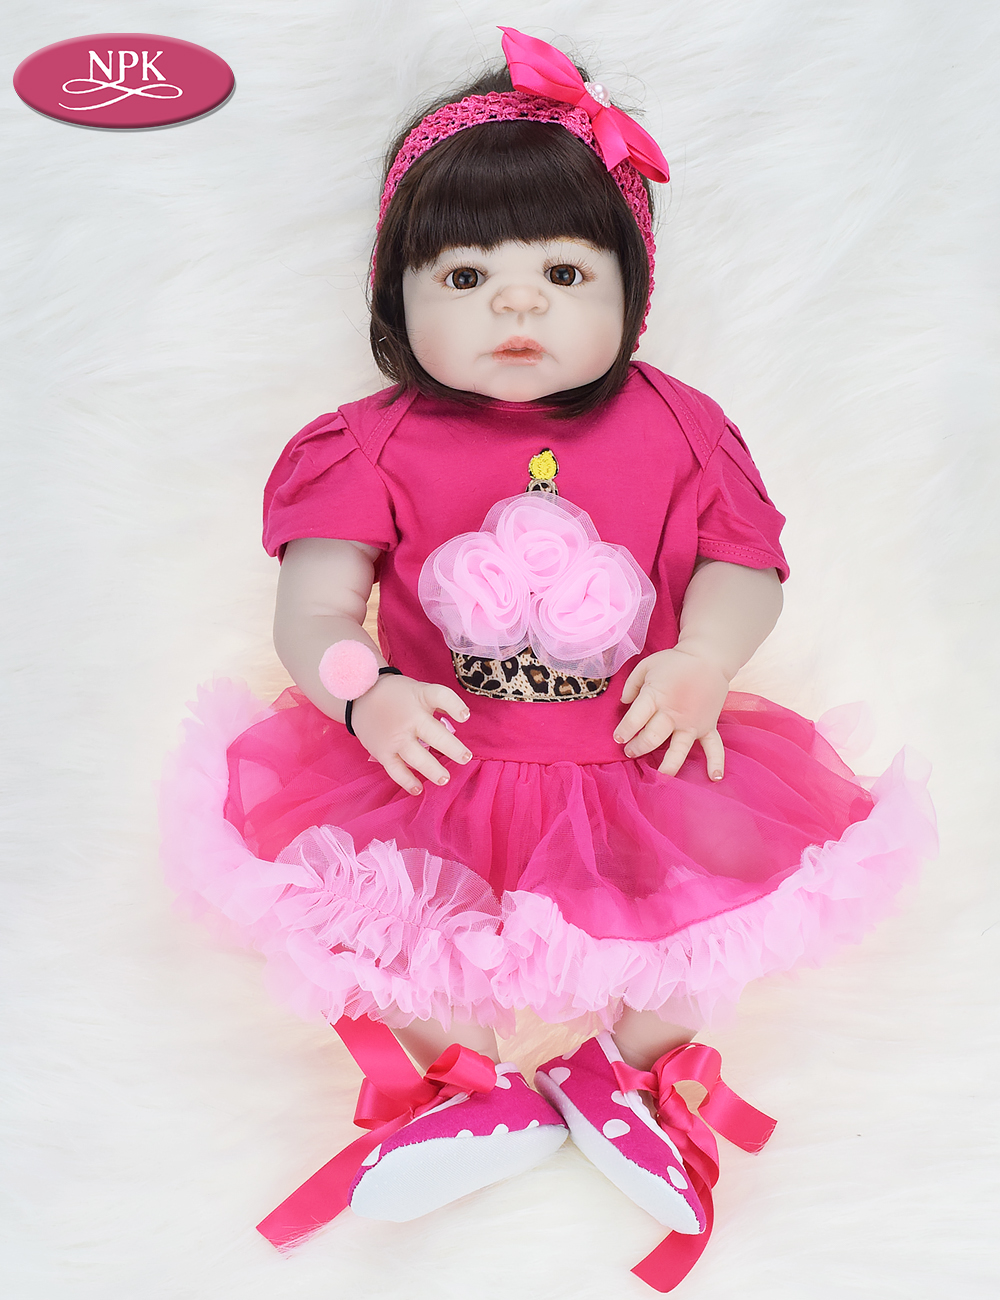 NPK 57CM Full Body Soft Silicone Girls Reborn Baby Doll Bathe Toys Lifelike Princess Girl Dolls Bebe Real Reborn Boneca Menina  (7)